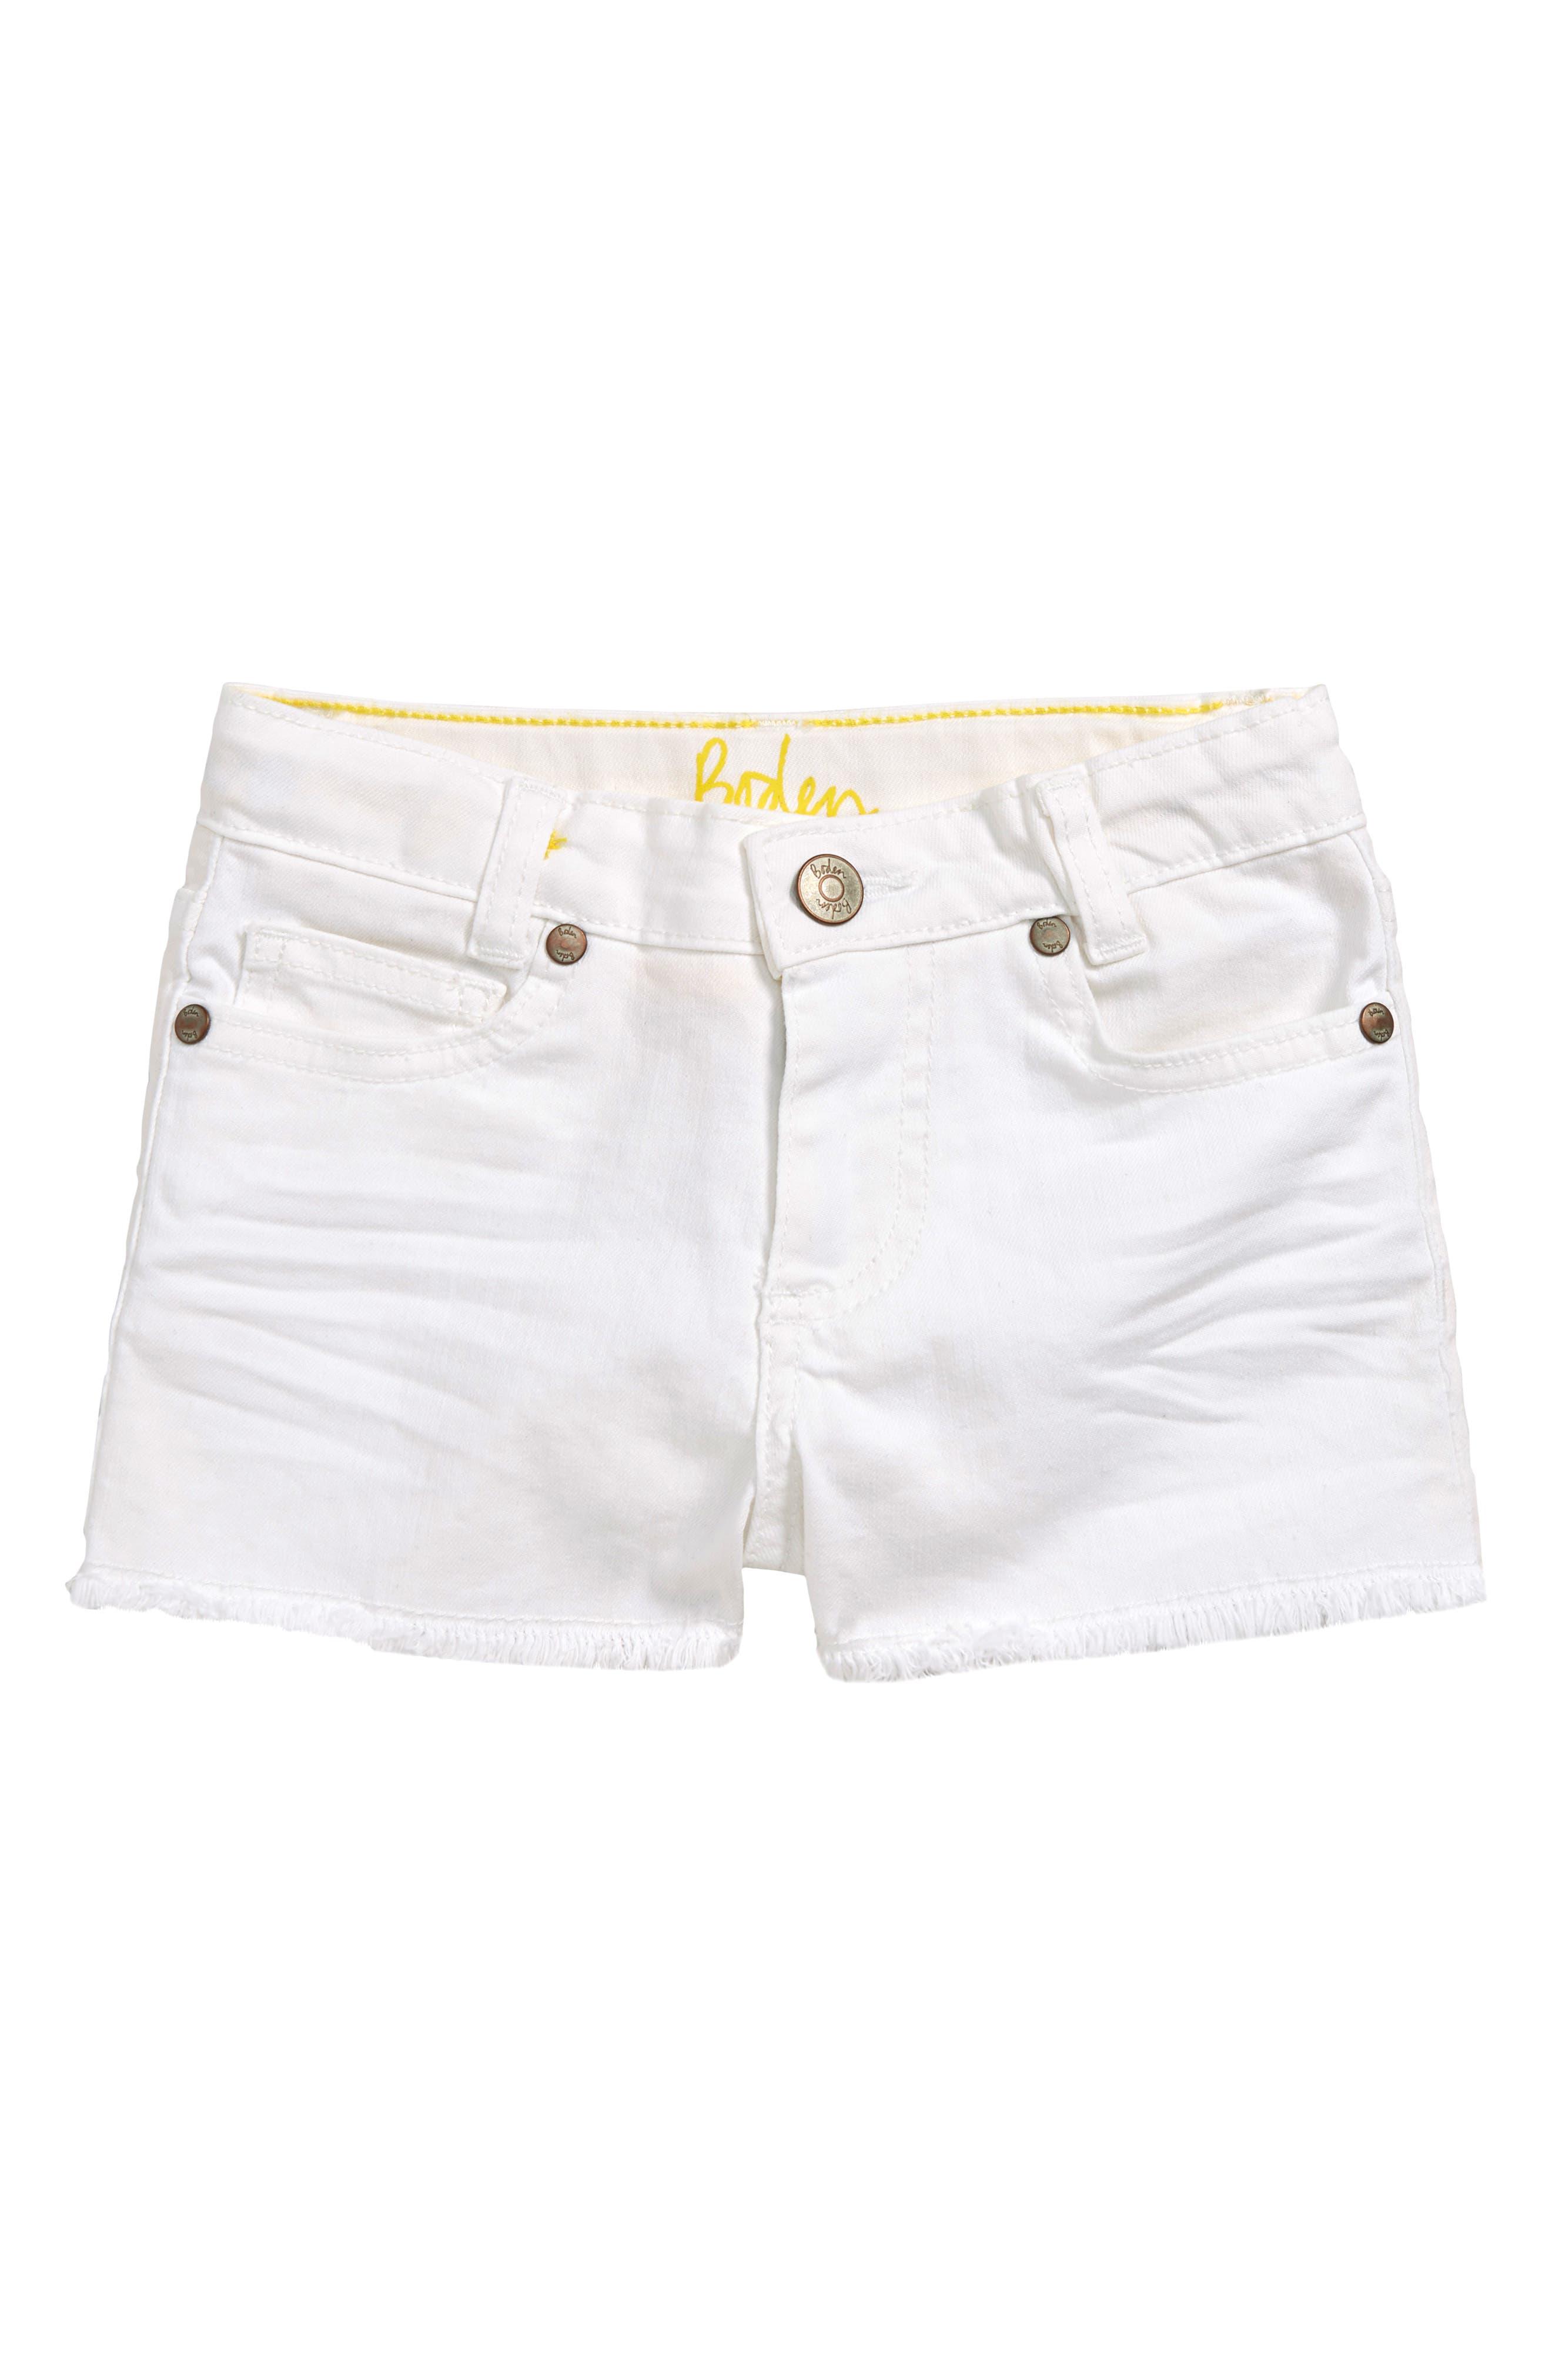 Girls Mini Boden Cutoff Denim Shorts Size 9Y  Yellow